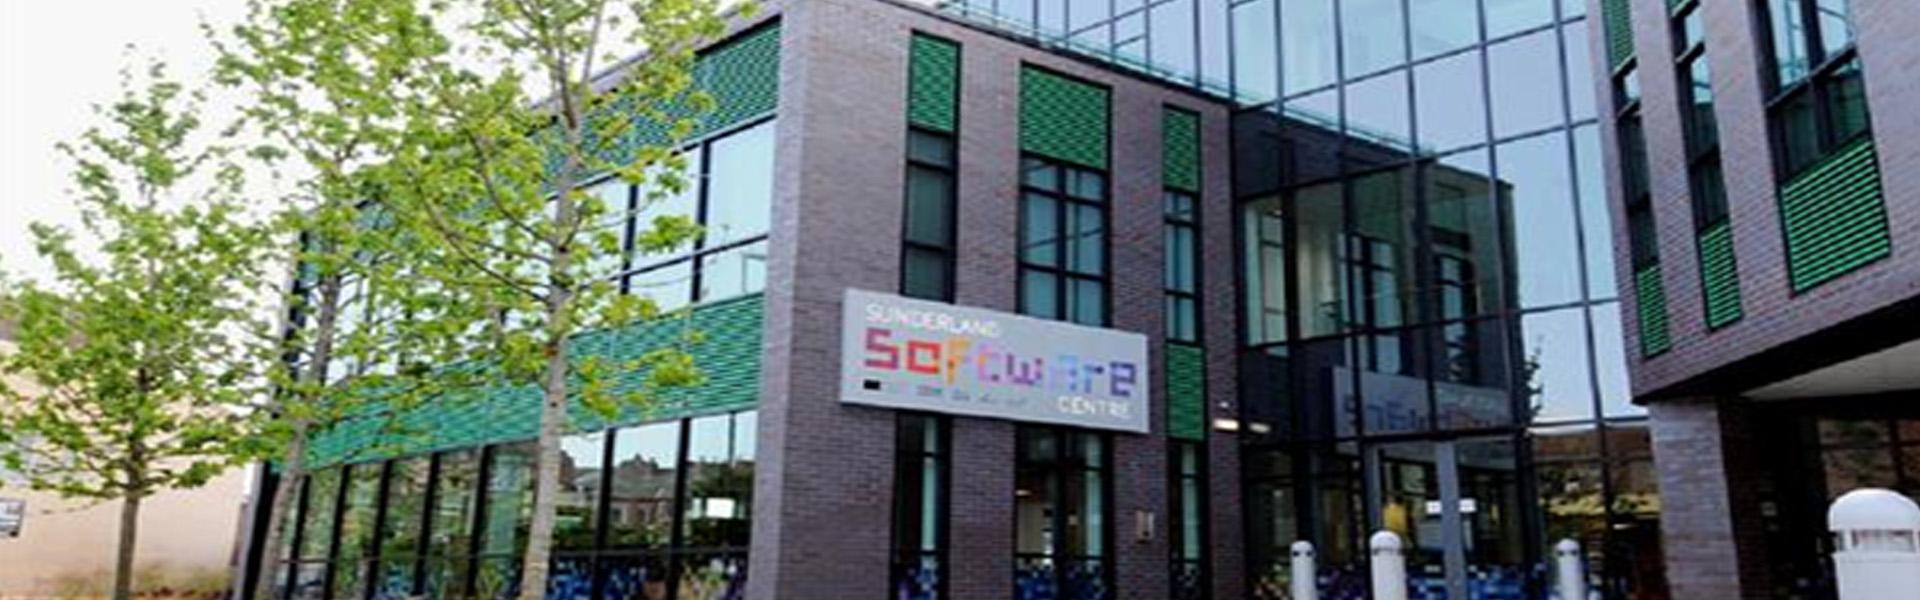 sunderland software city case study